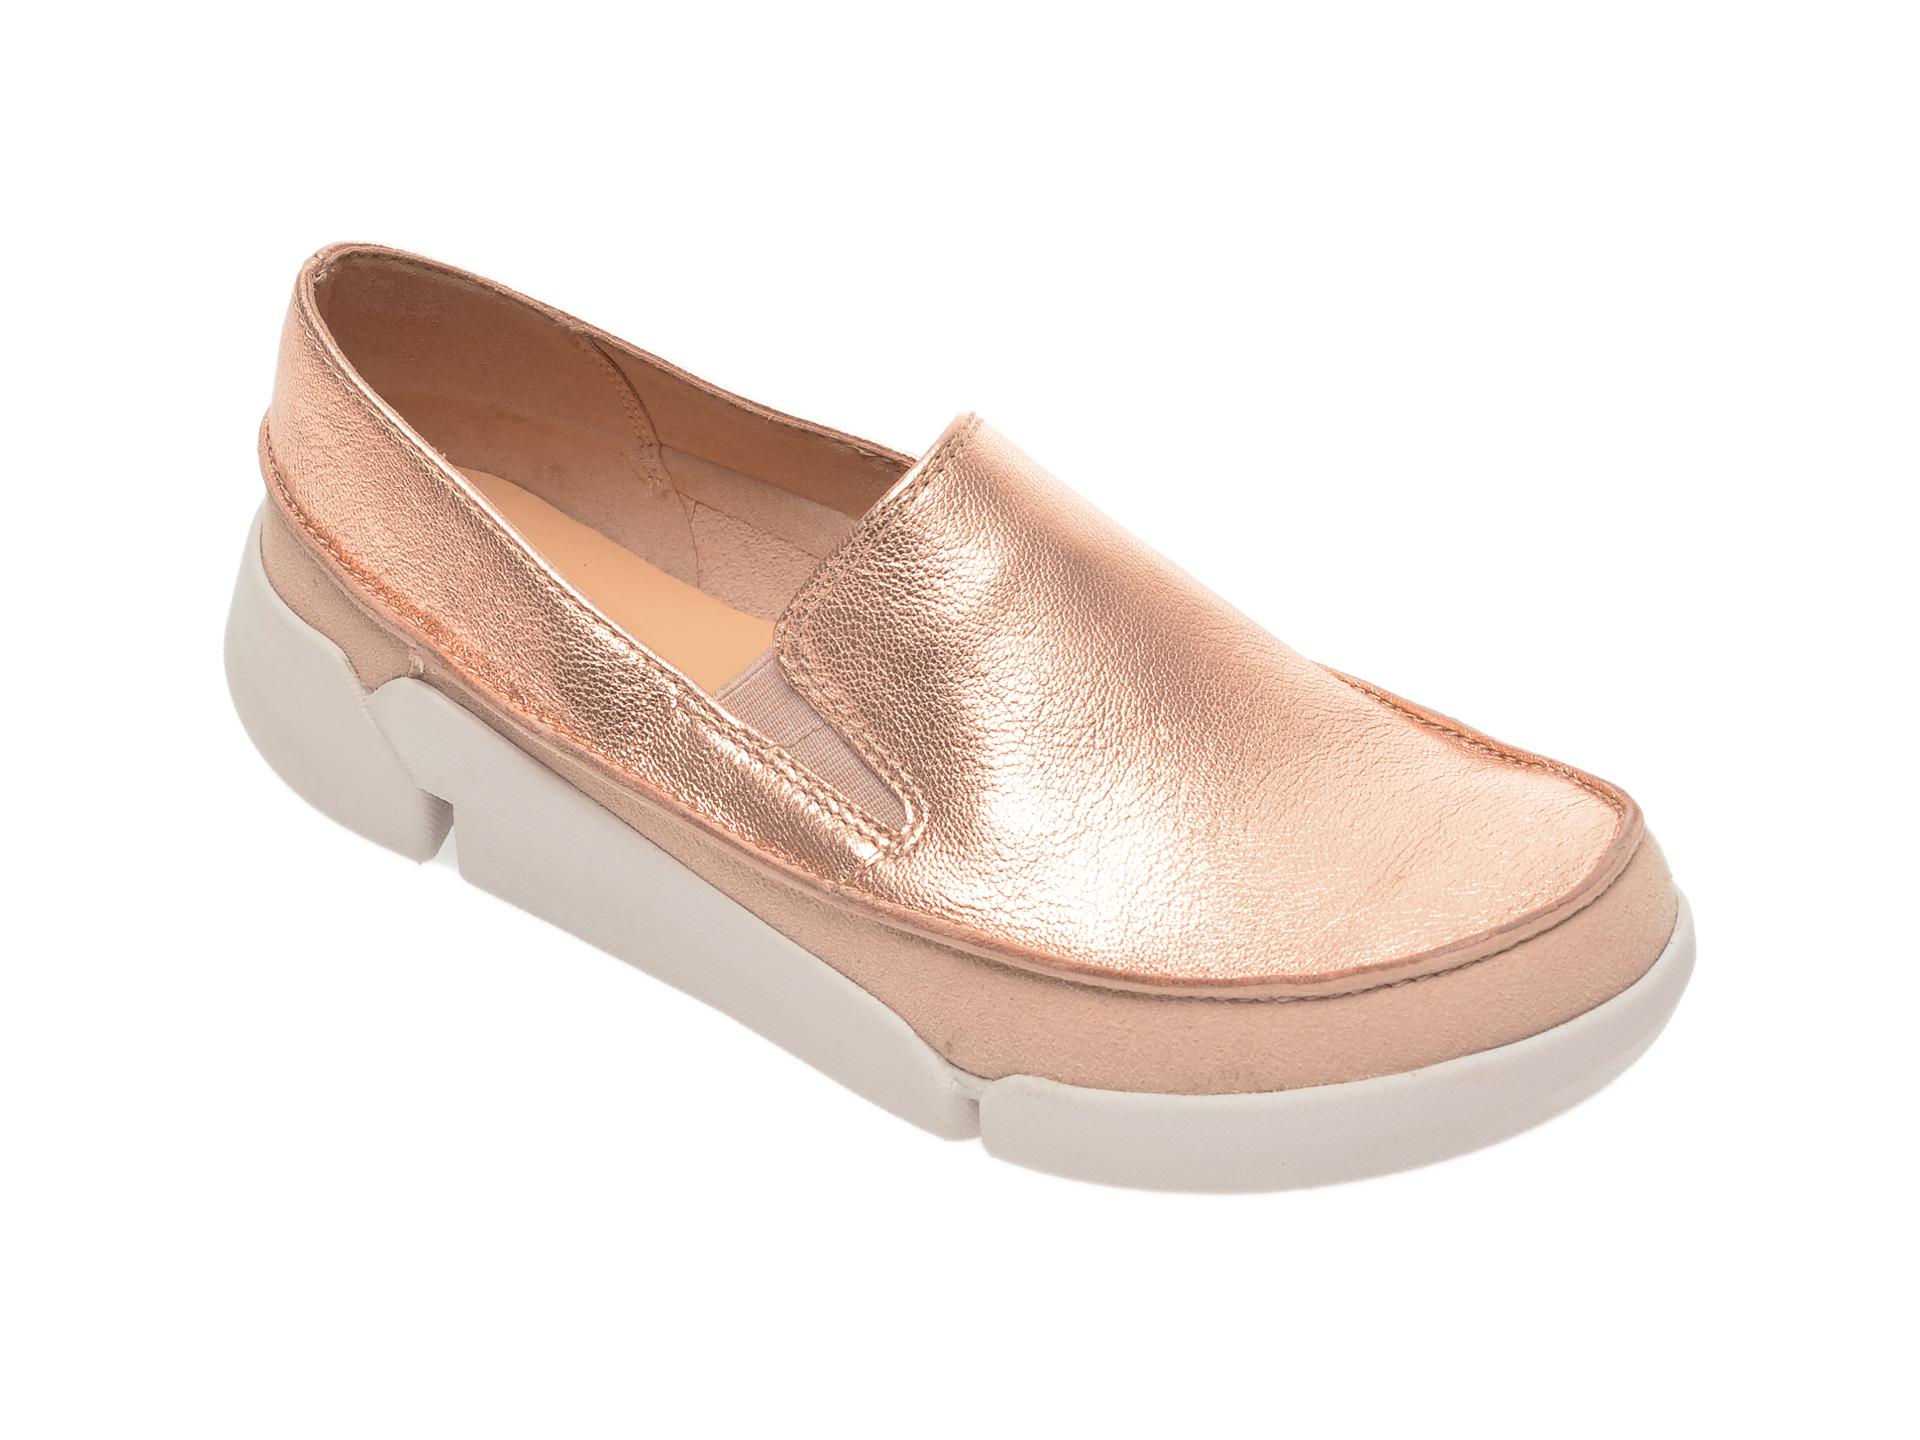 Pantofi CLARKS roz, Tri Step, din piele naturala si piele intoarsa imagine